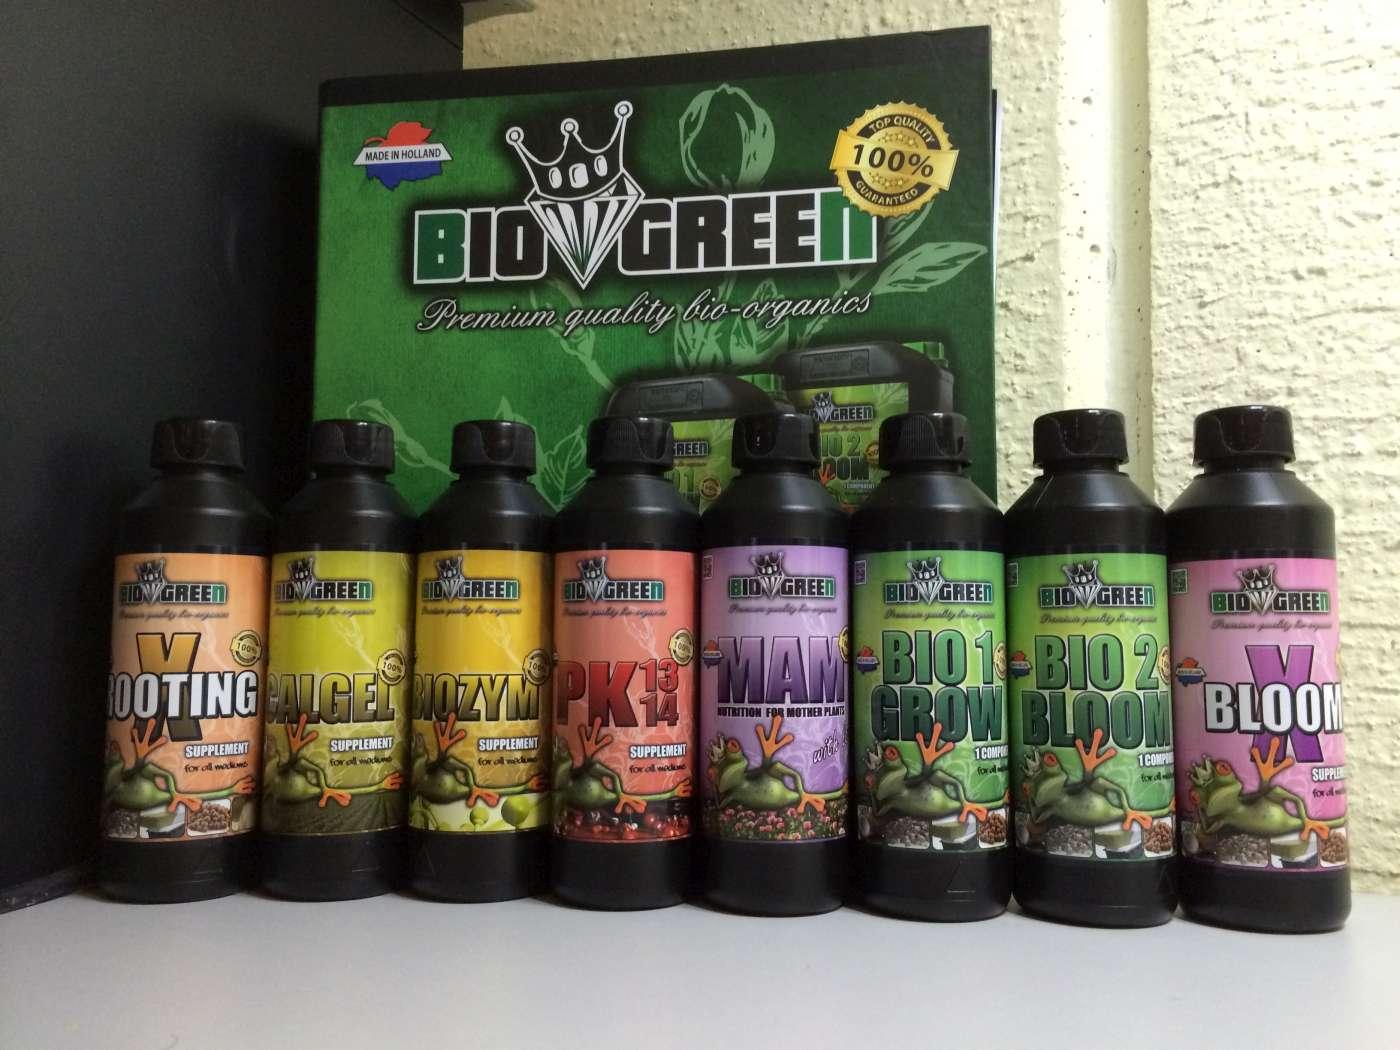 photo gamme bio green gamme